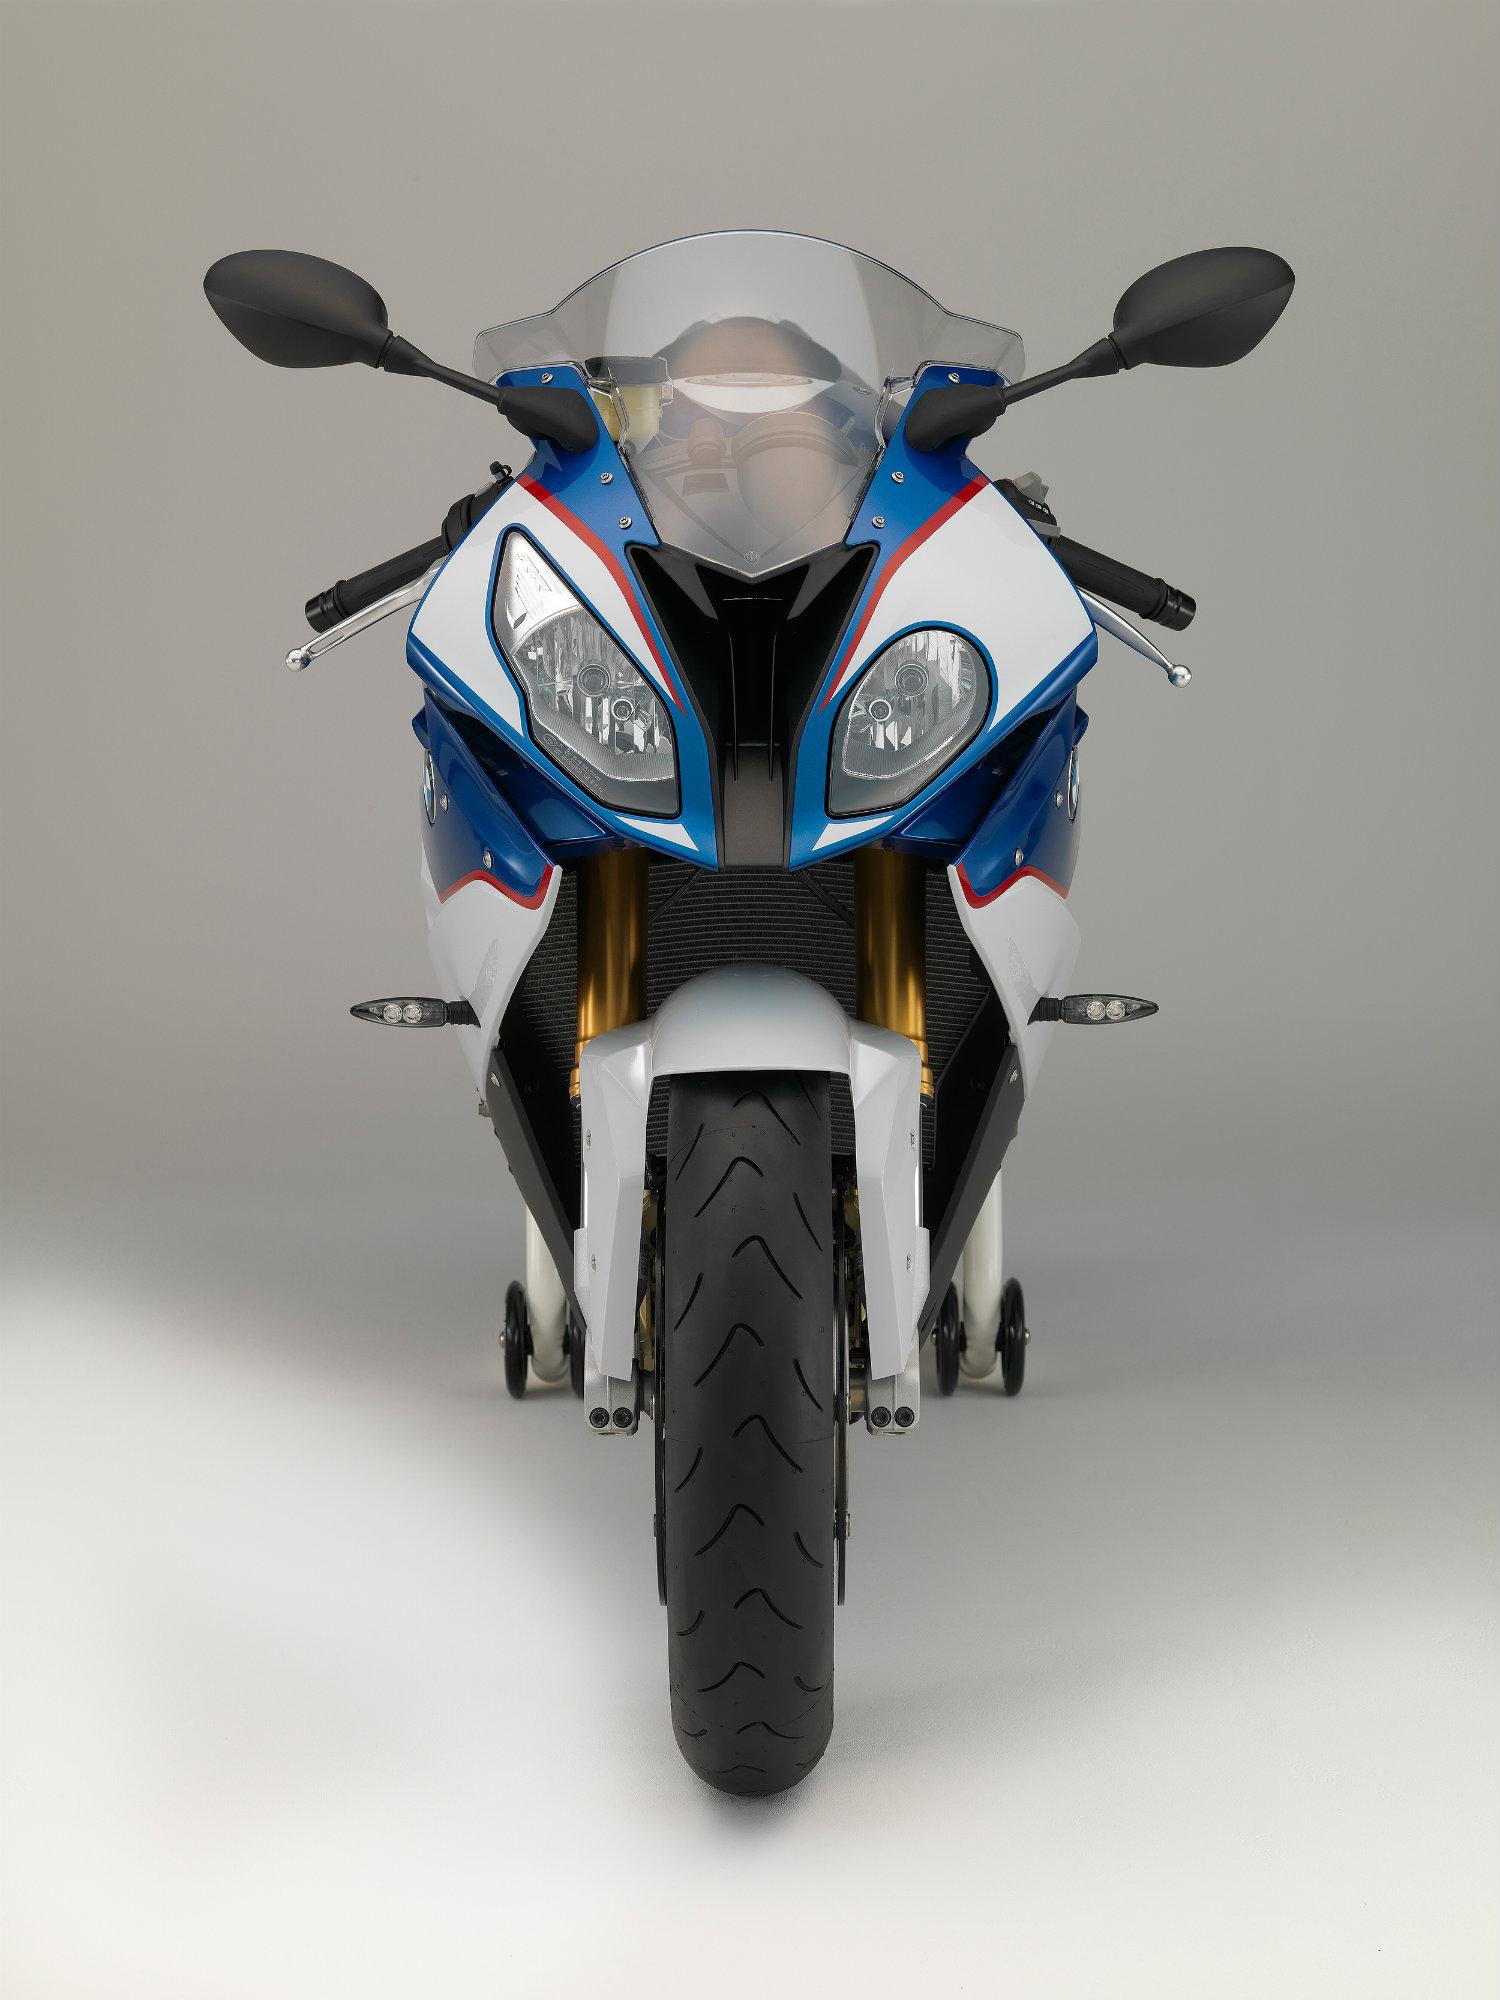 Intermot 2014: New BMW S1000RR unveiled